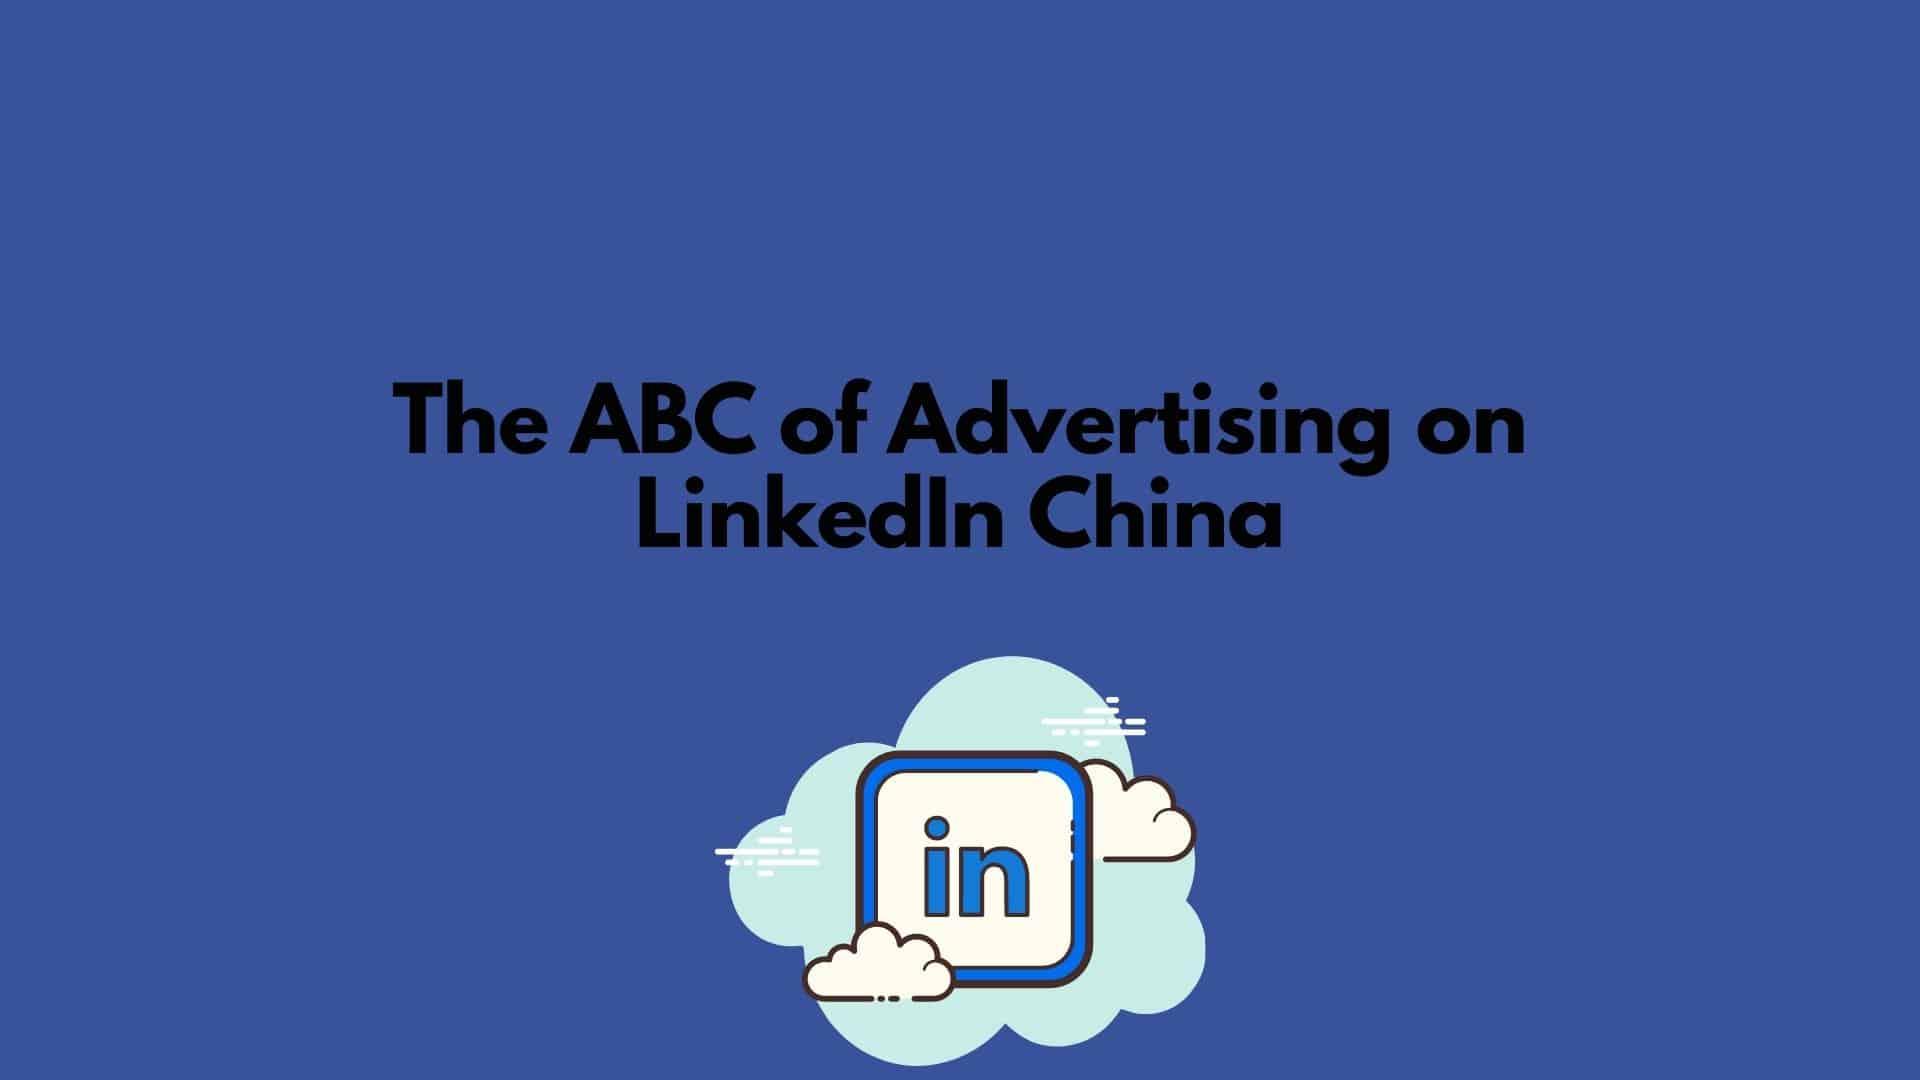 Linkedin-China-Advertising.jpg